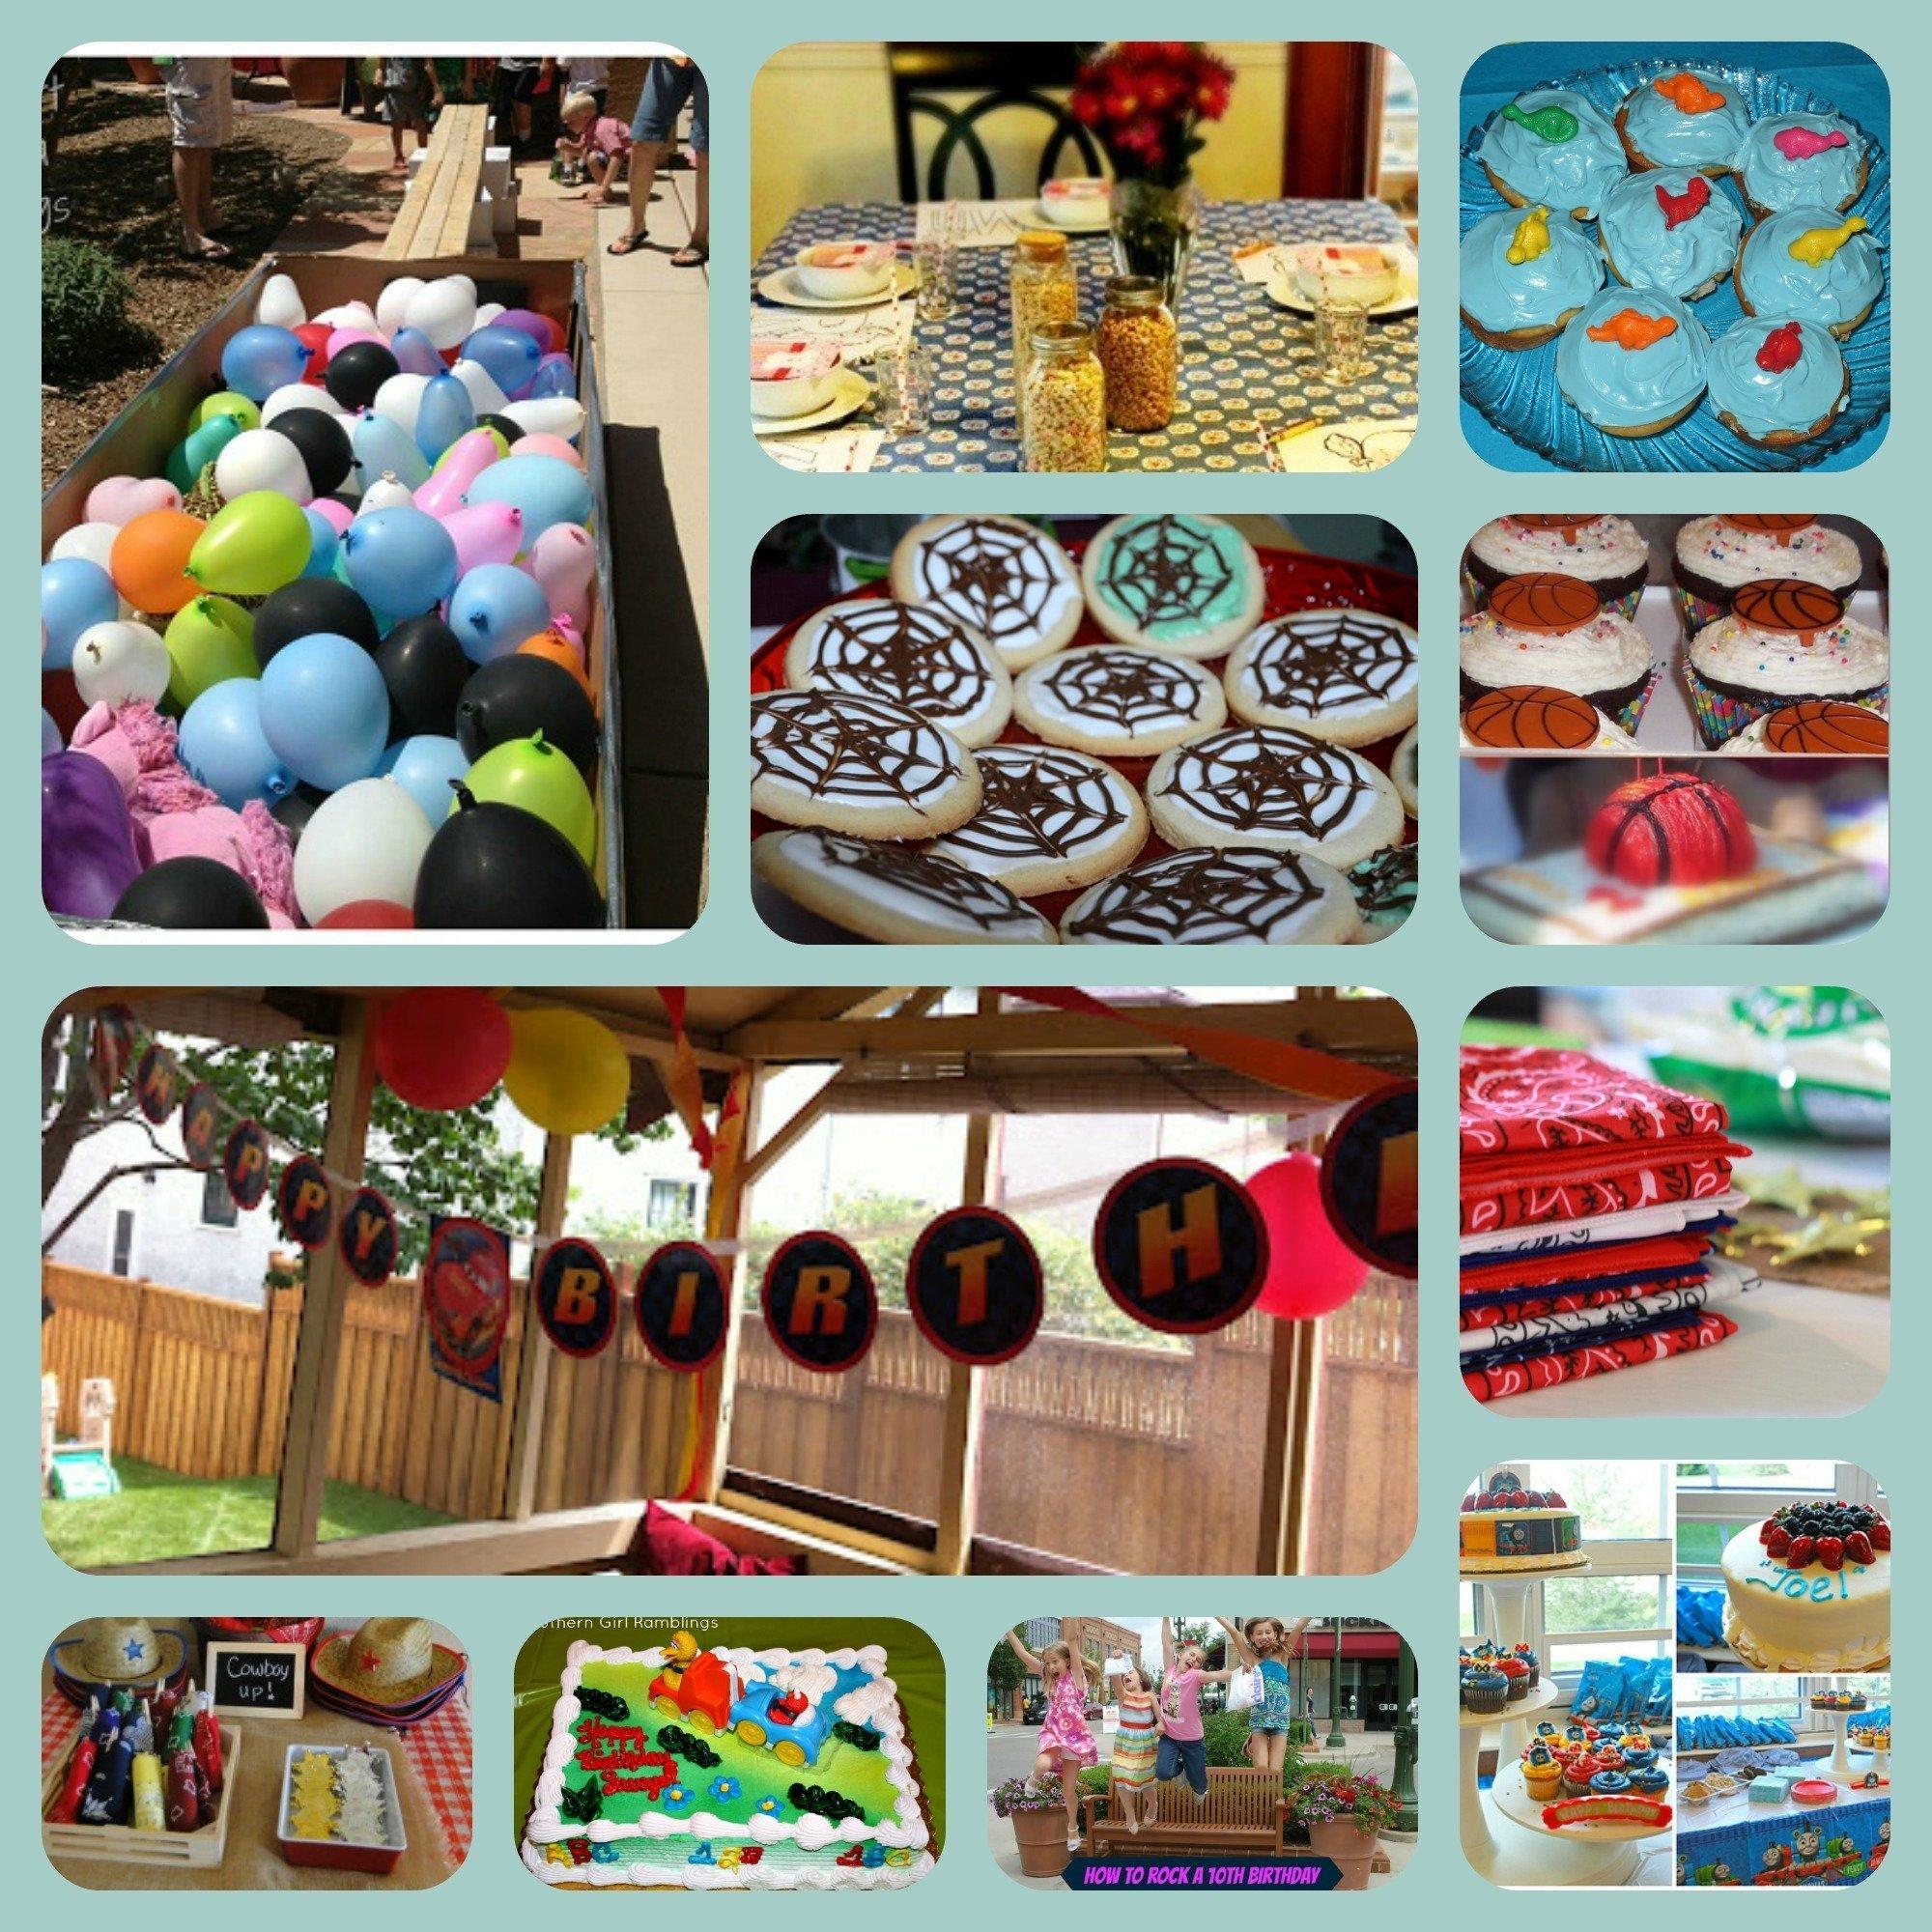 10 Best 10 Year Old Boy Party Ideas 10 year old boy birthday party game ideas wedding 3